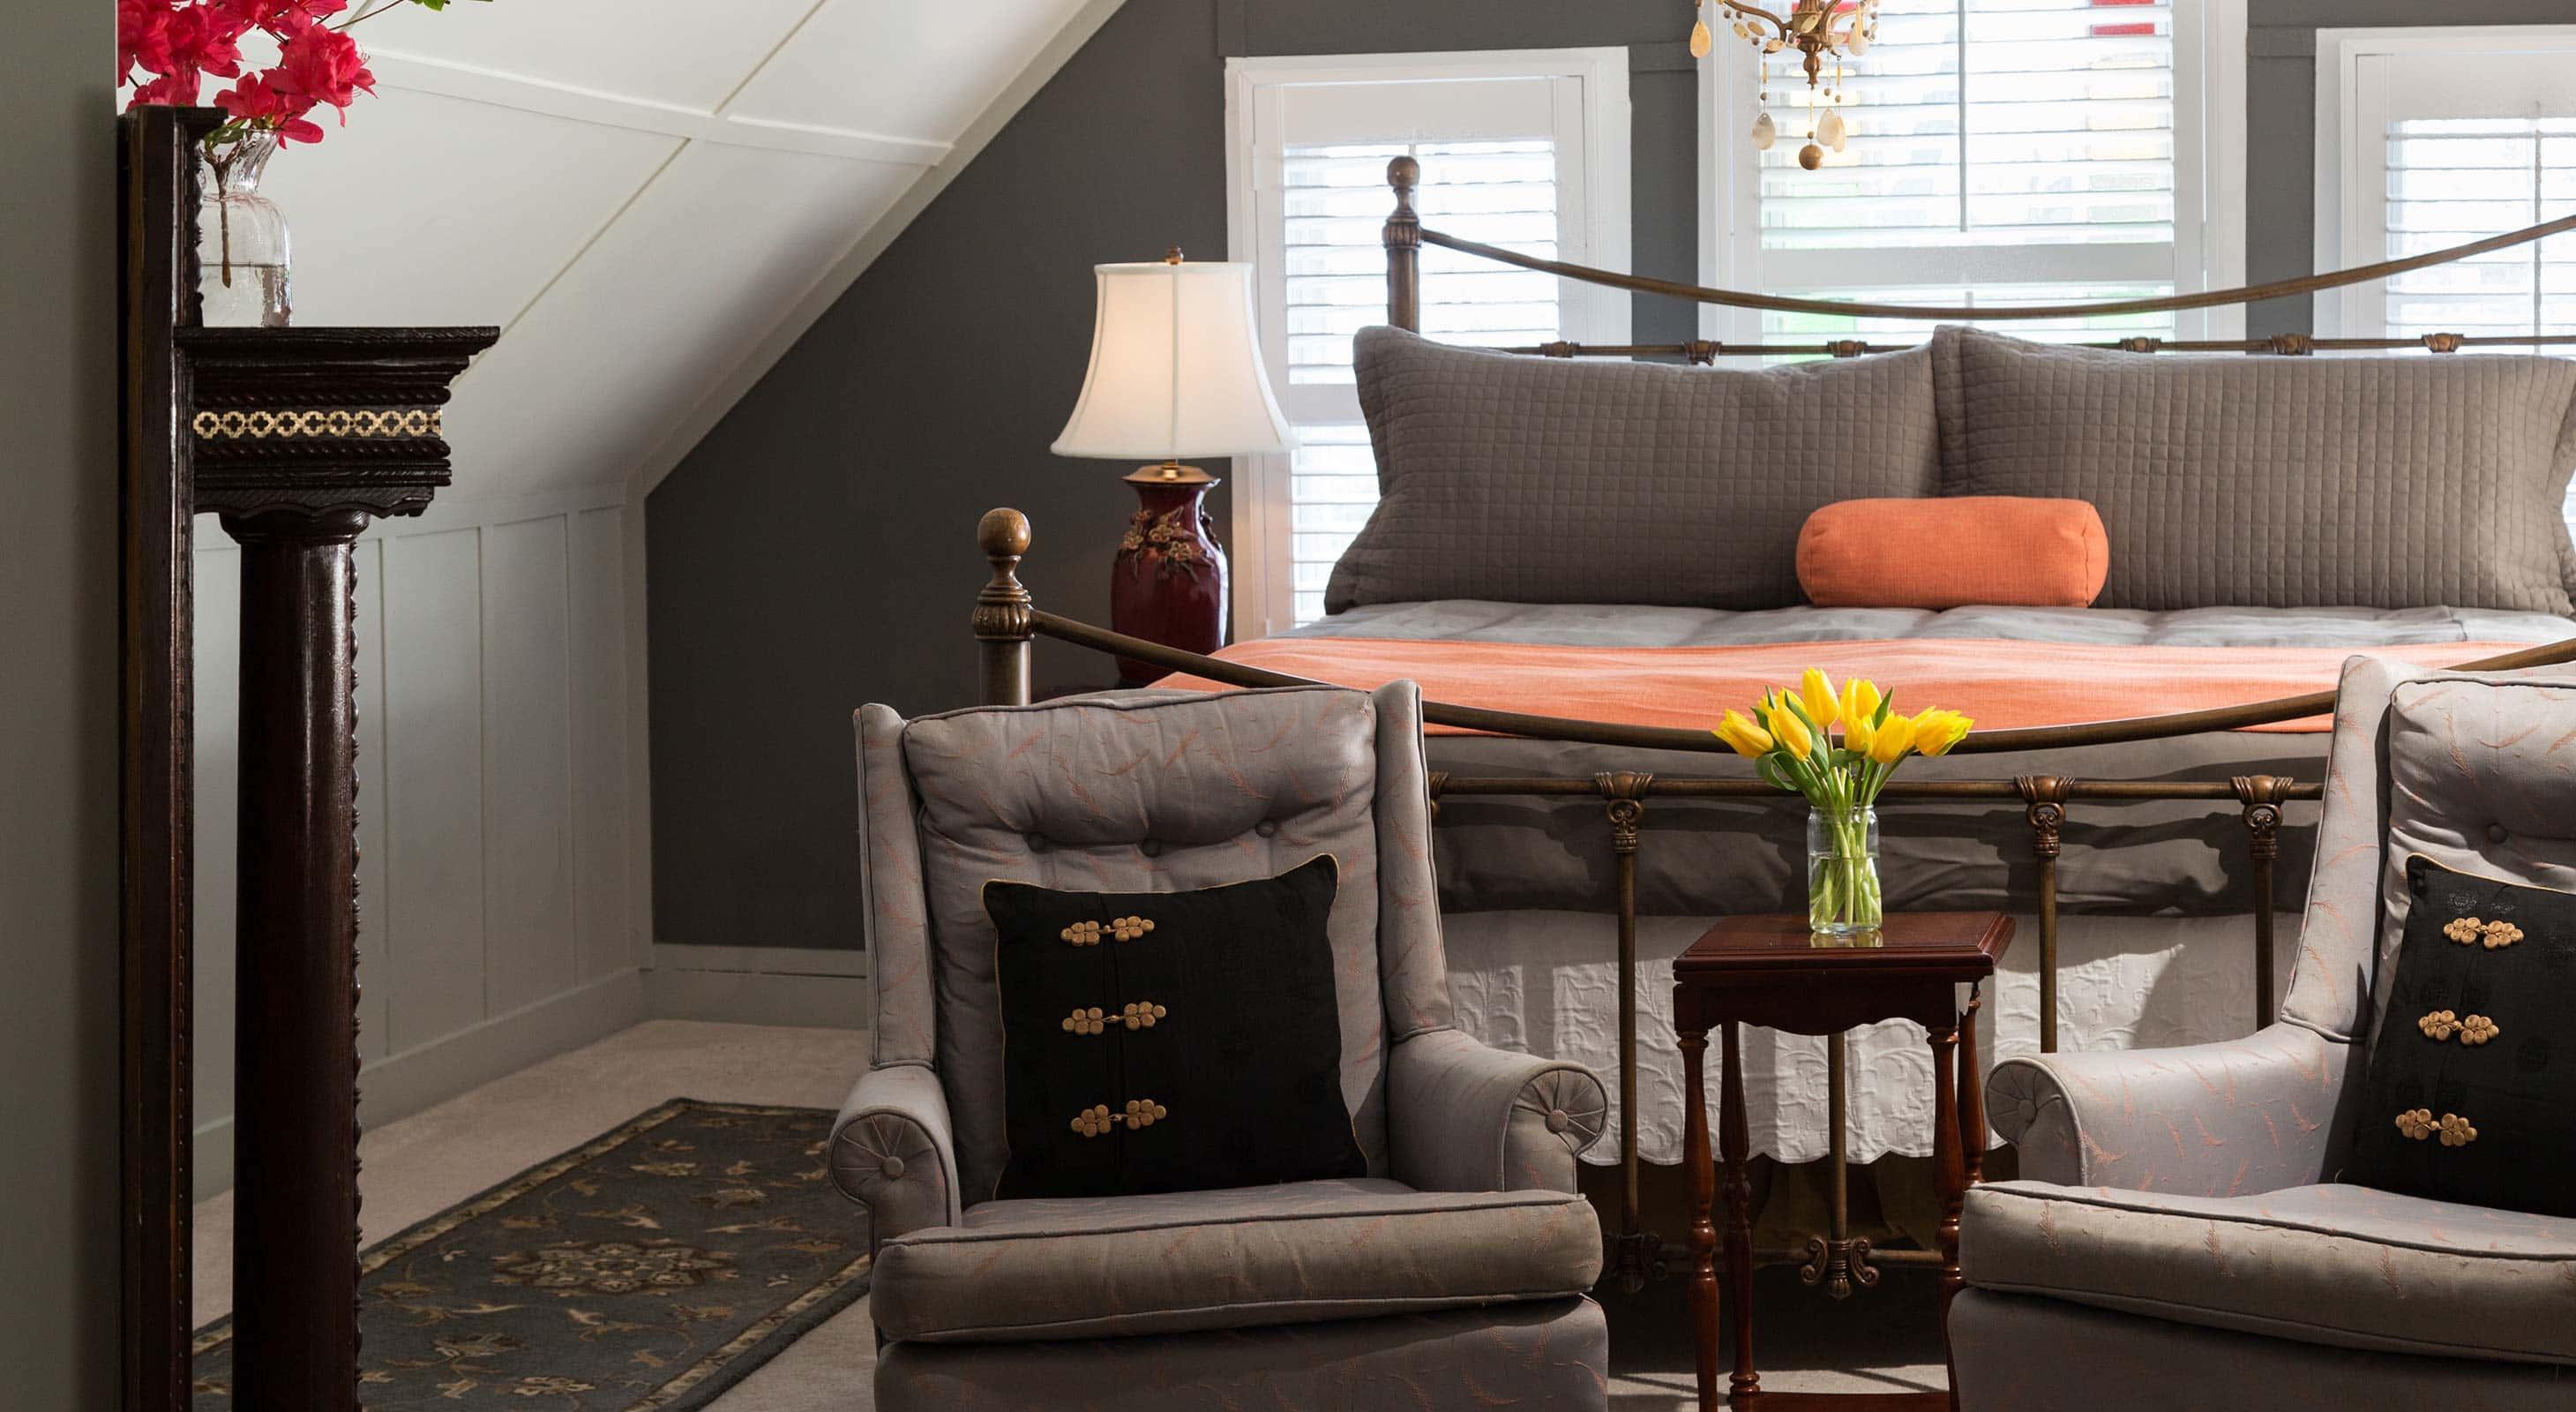 Garret Room at Our Inn in Manteo NC